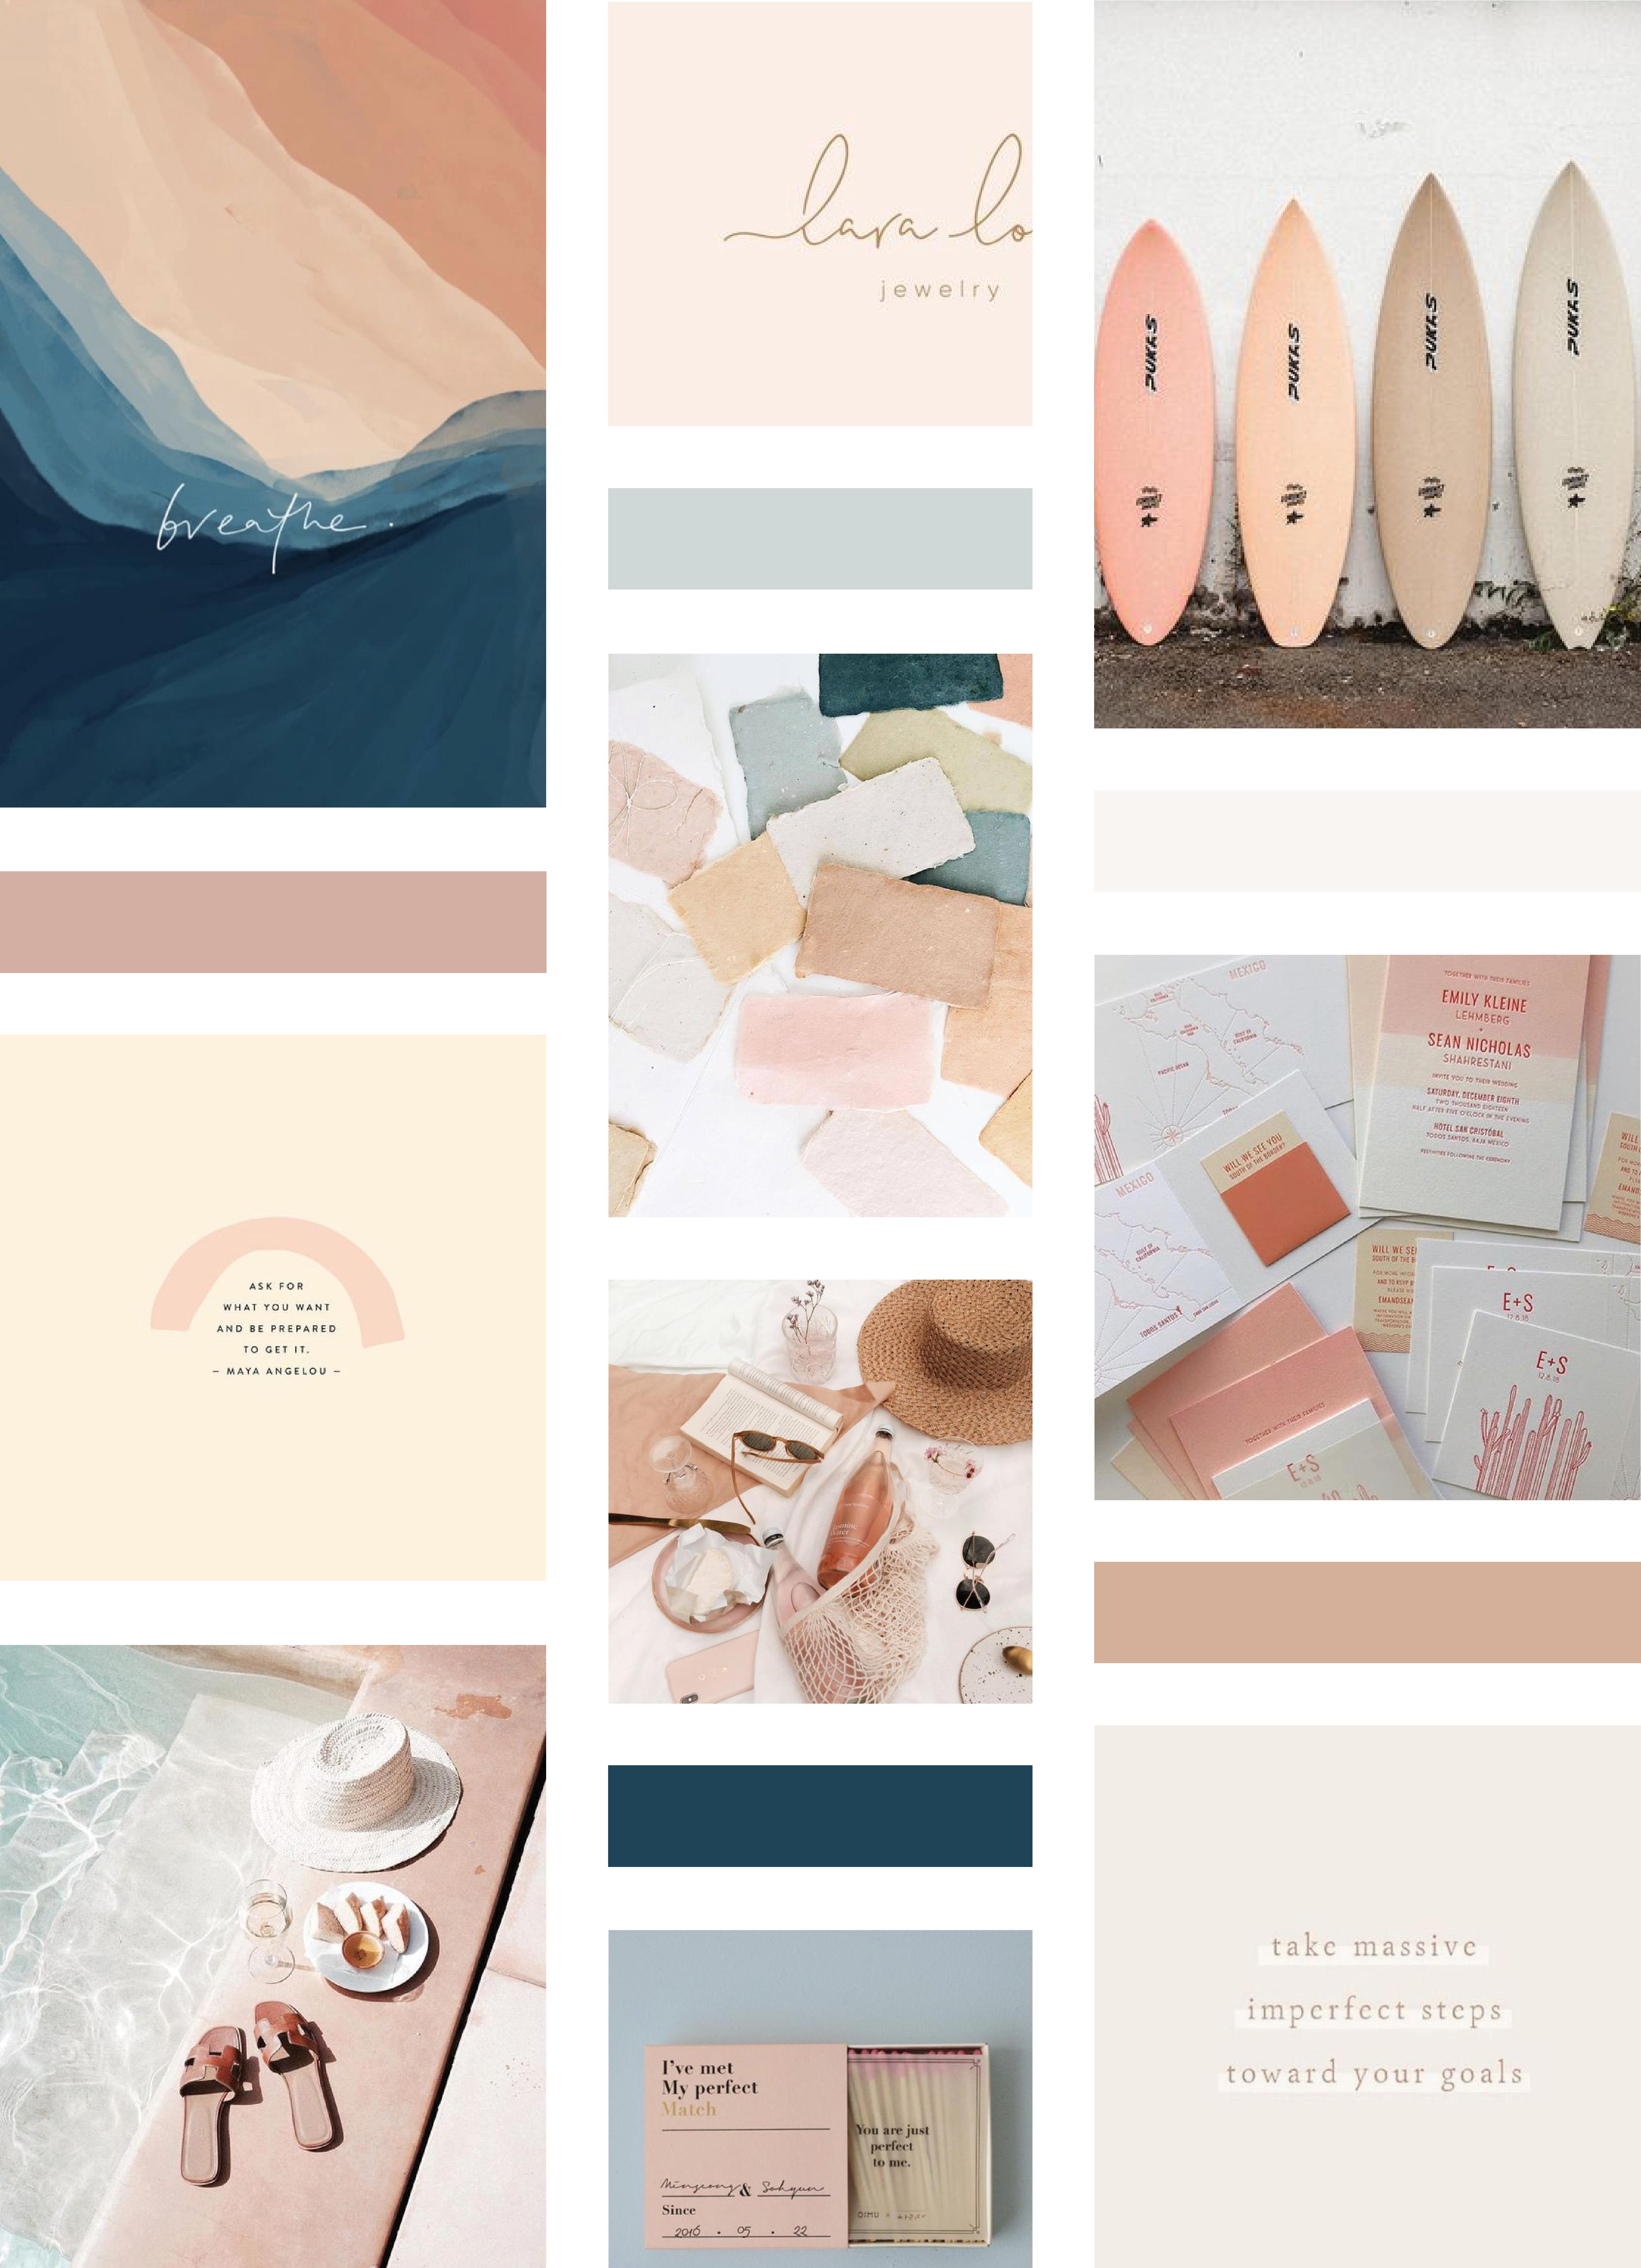 A Branding Web Design Studio Showit Designer Beachy Summer Moodboard F In 2020 Branding Mood Board Inspiration Photography Branding Branding Design Inspiration